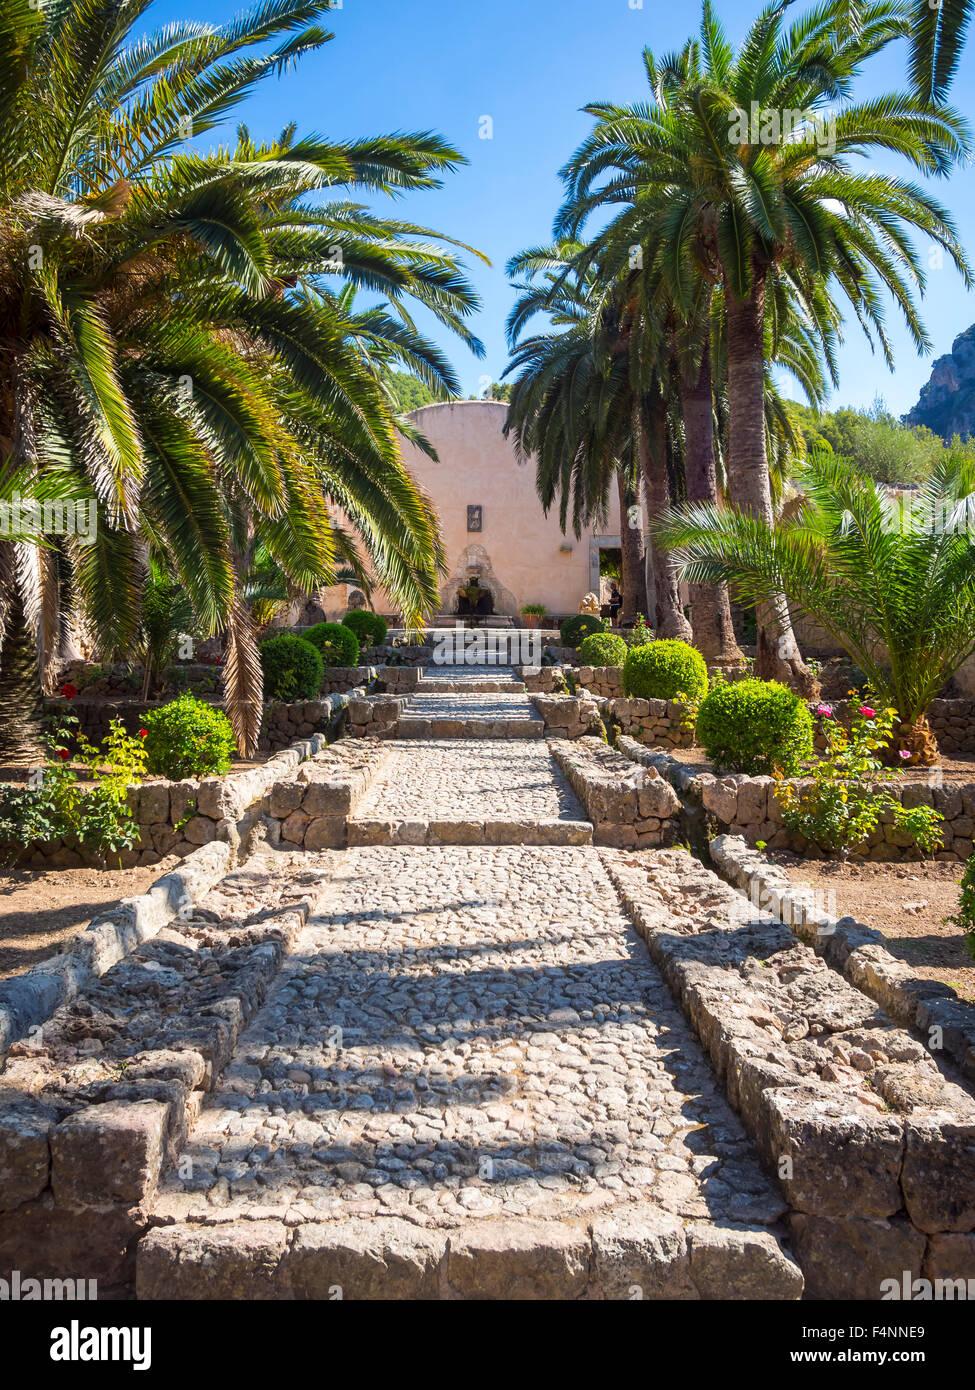 Jardines de Alfabia, mansion with Arabic gardens, Serra de Alfàbia, Mallorca, Spain - Stock Image